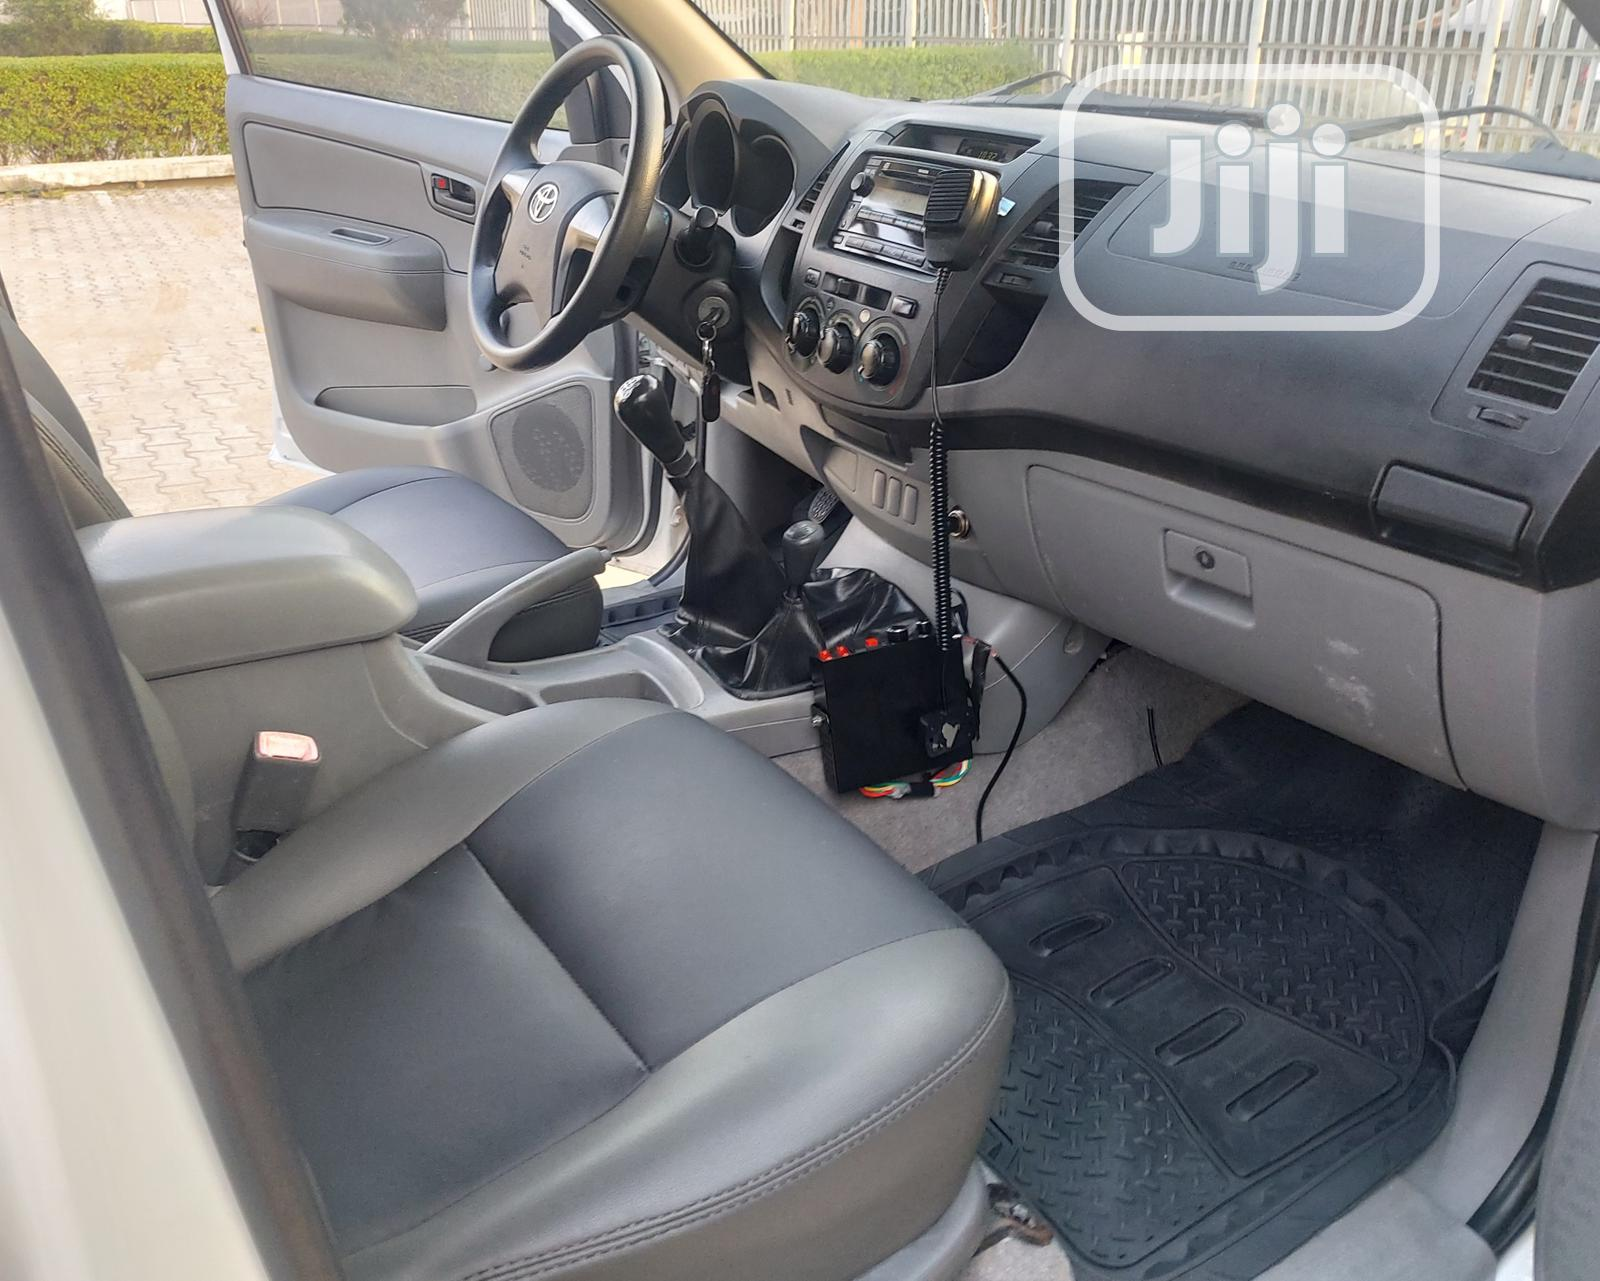 Toyota Hilux 2.7 VVT-i 4X4 SRX 2012 White | Cars for sale in Amuwo-Odofin, Lagos State, Nigeria